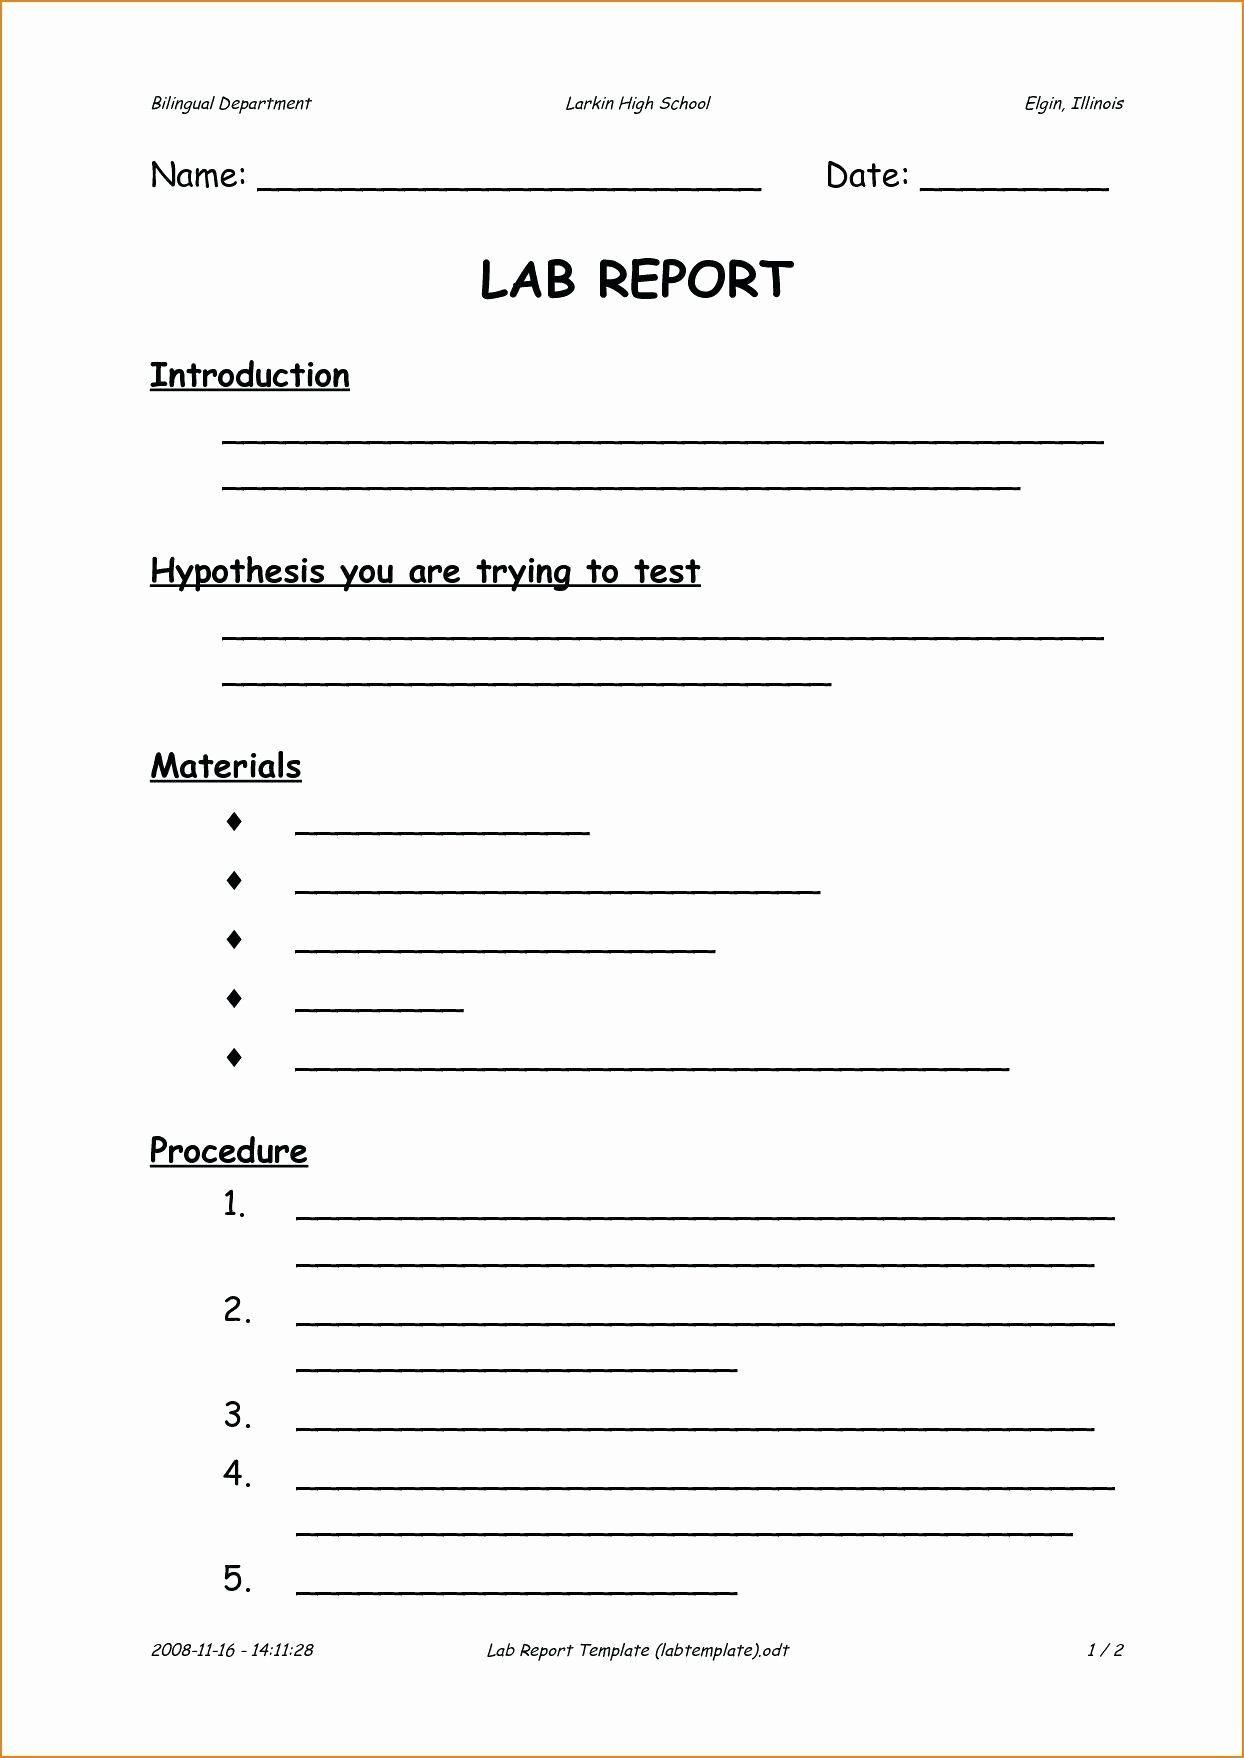 Scientific Method Worksheet High School Inspirational